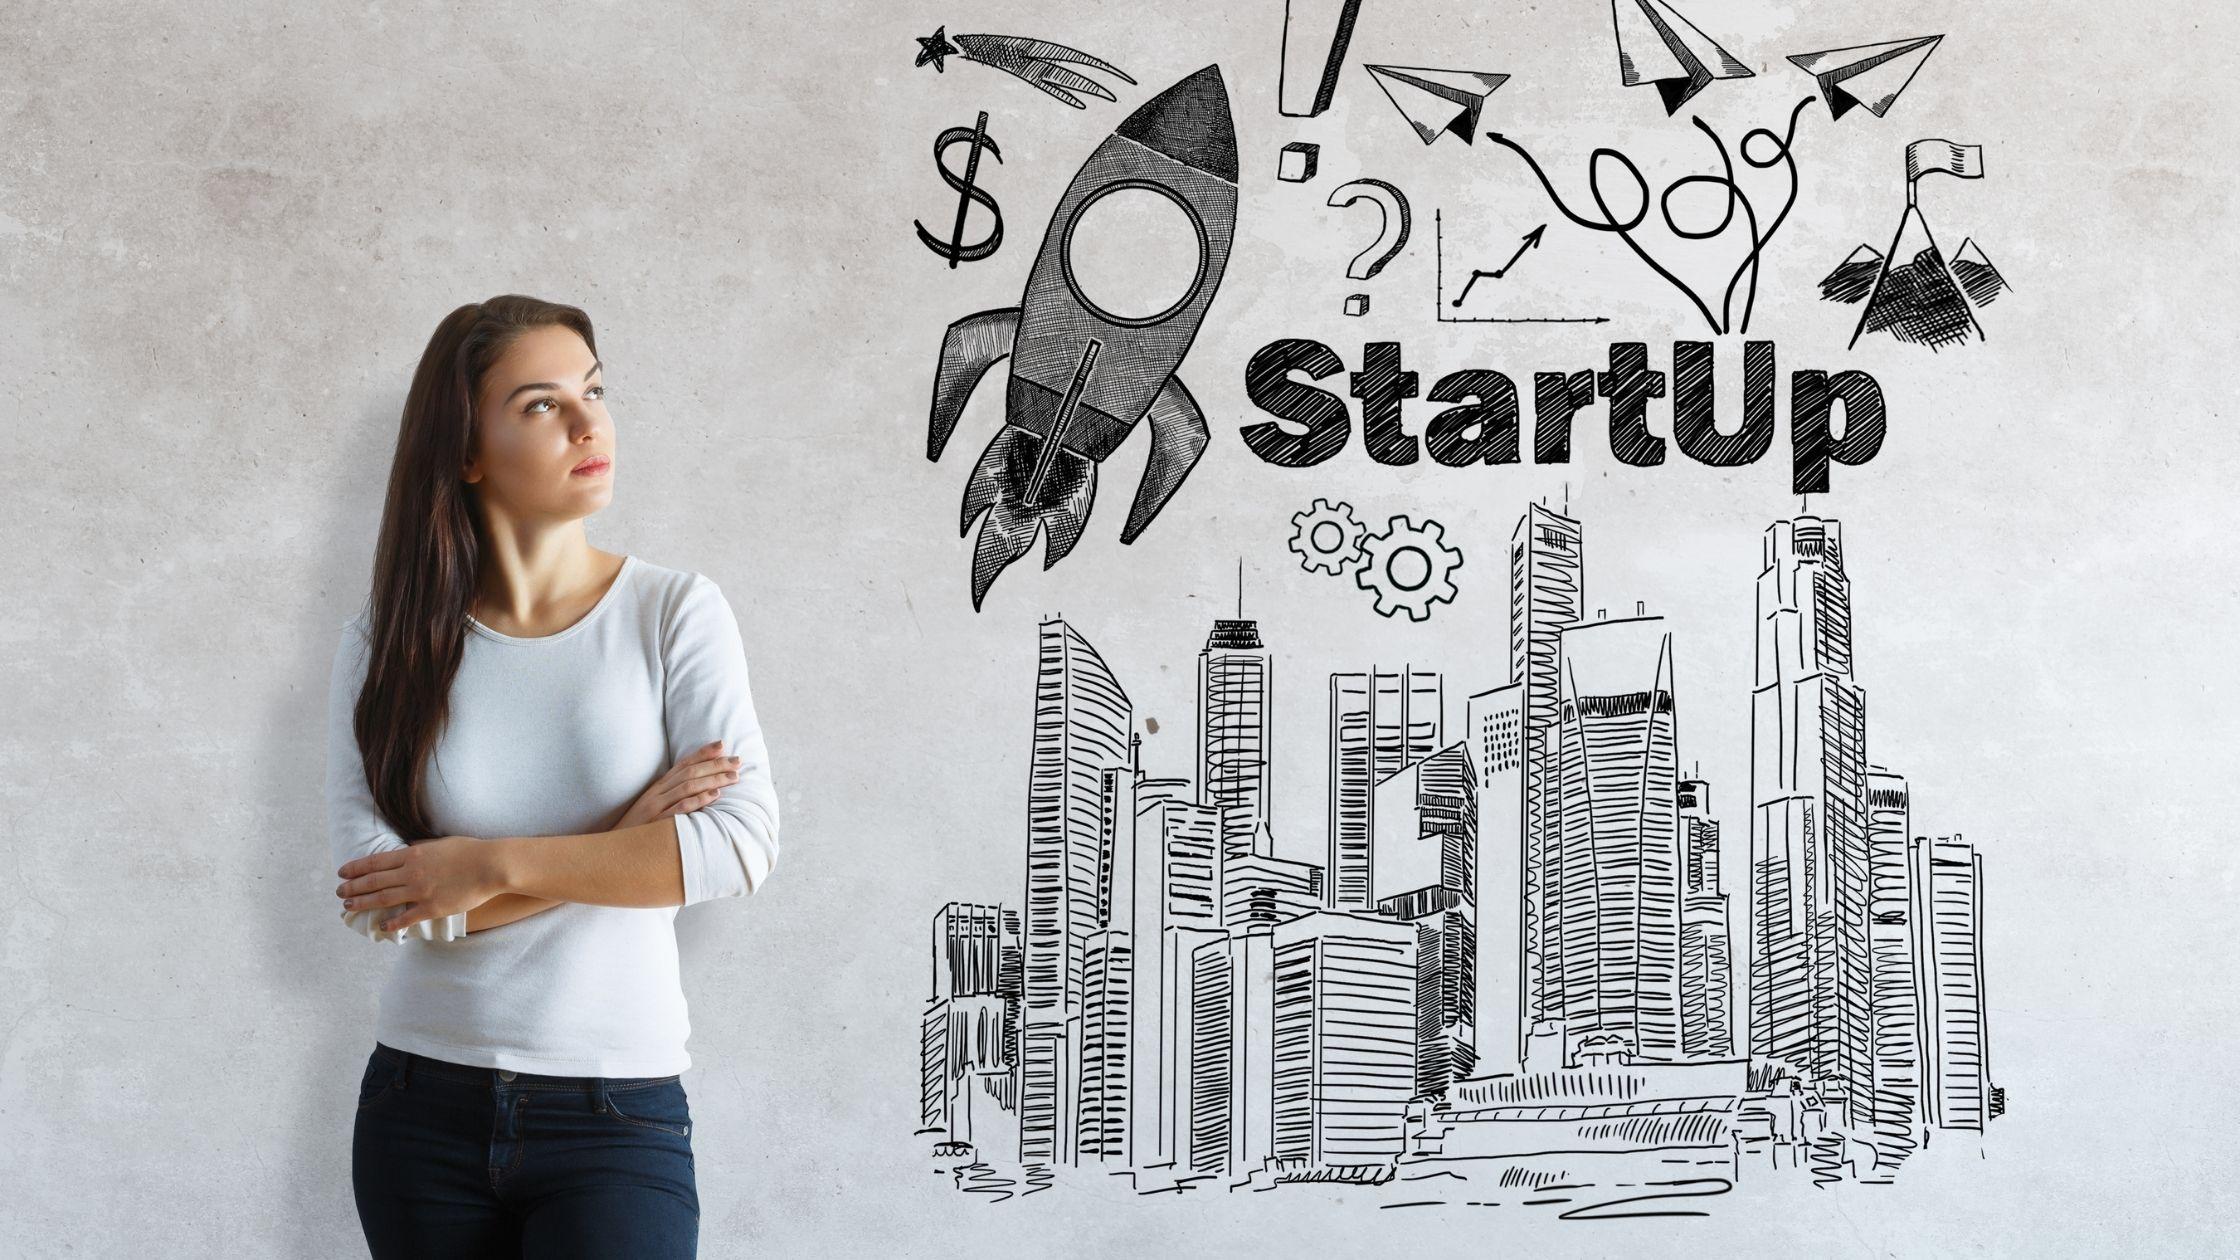 mujer emprendimiento digital startup